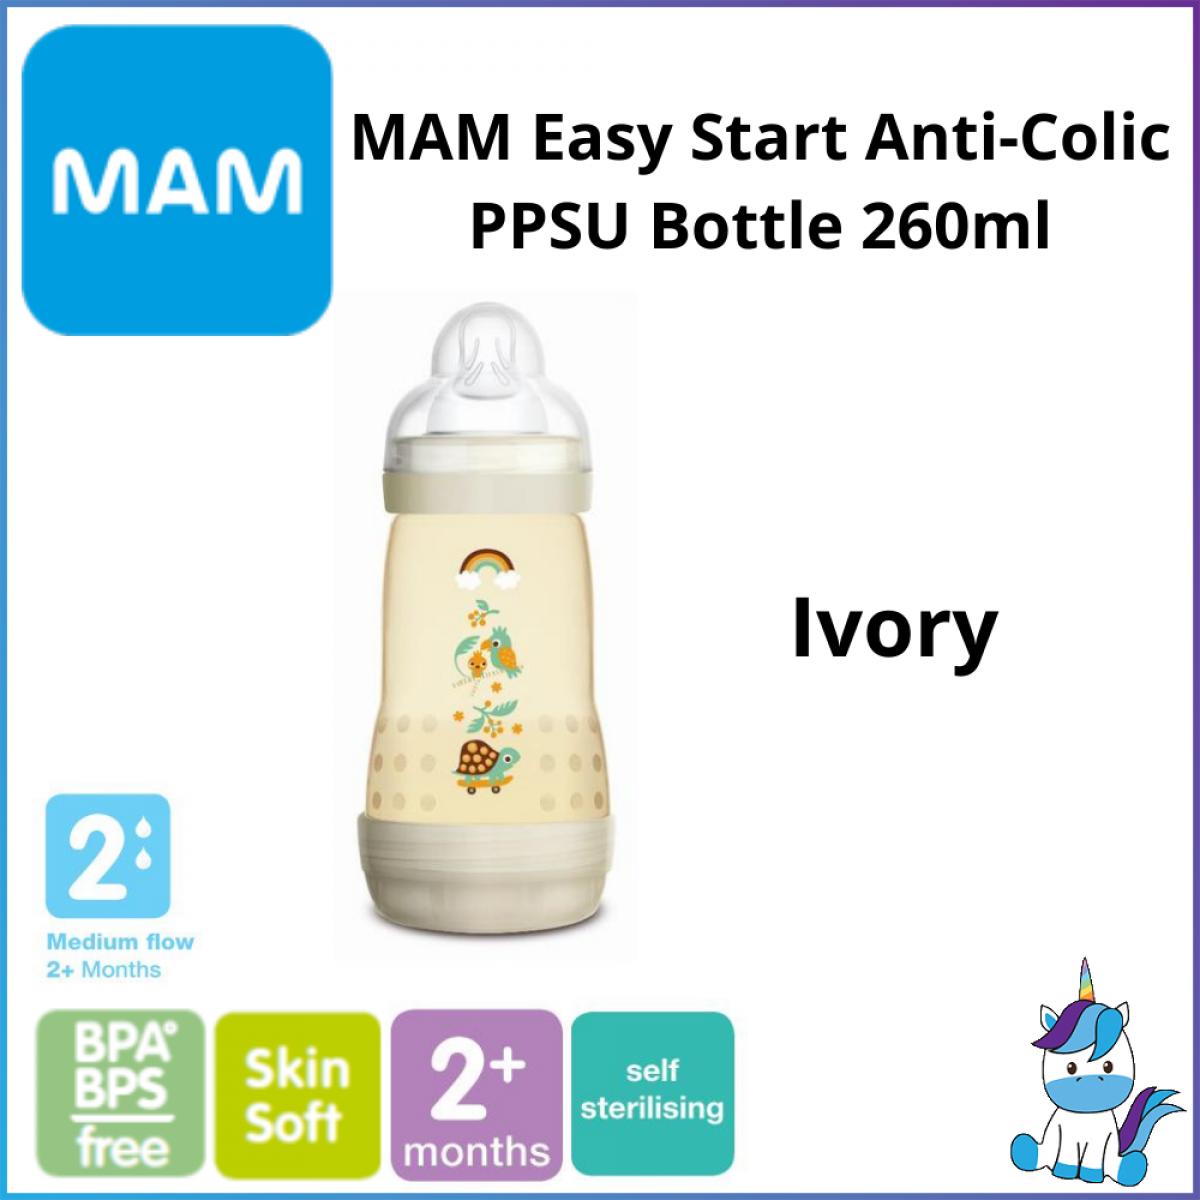 MAM Easy Start Anti-Colic PPSU Bottle